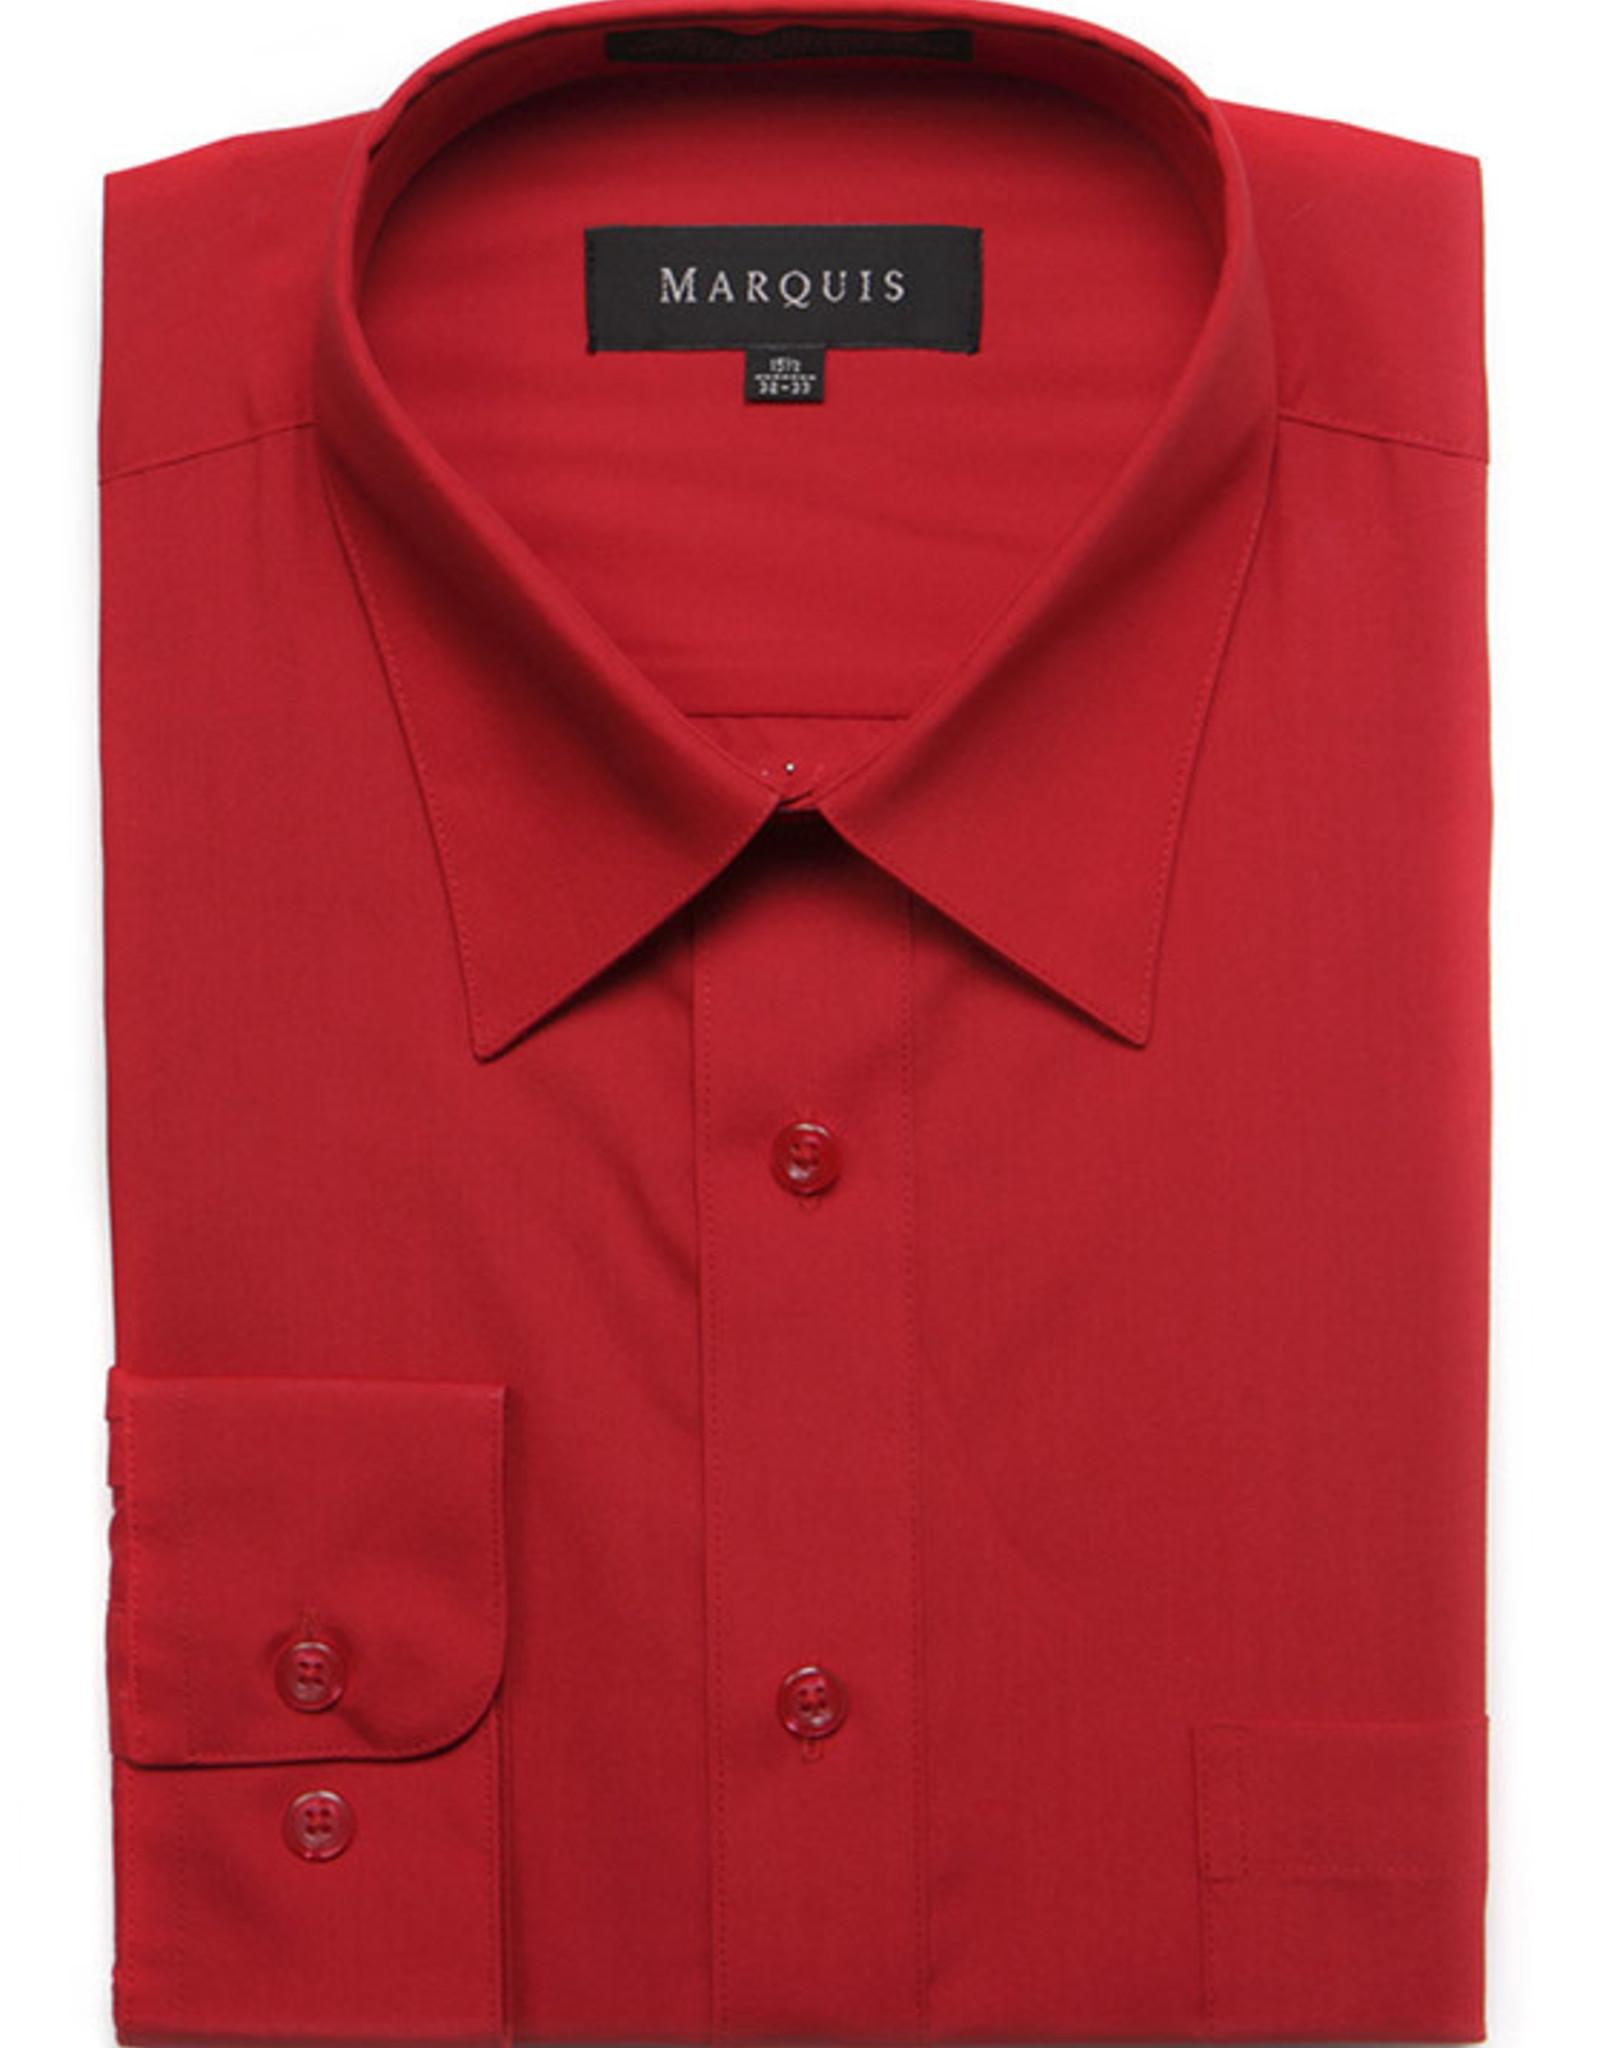 Marquis Dress Shirt MarQuis Regular Fit Red